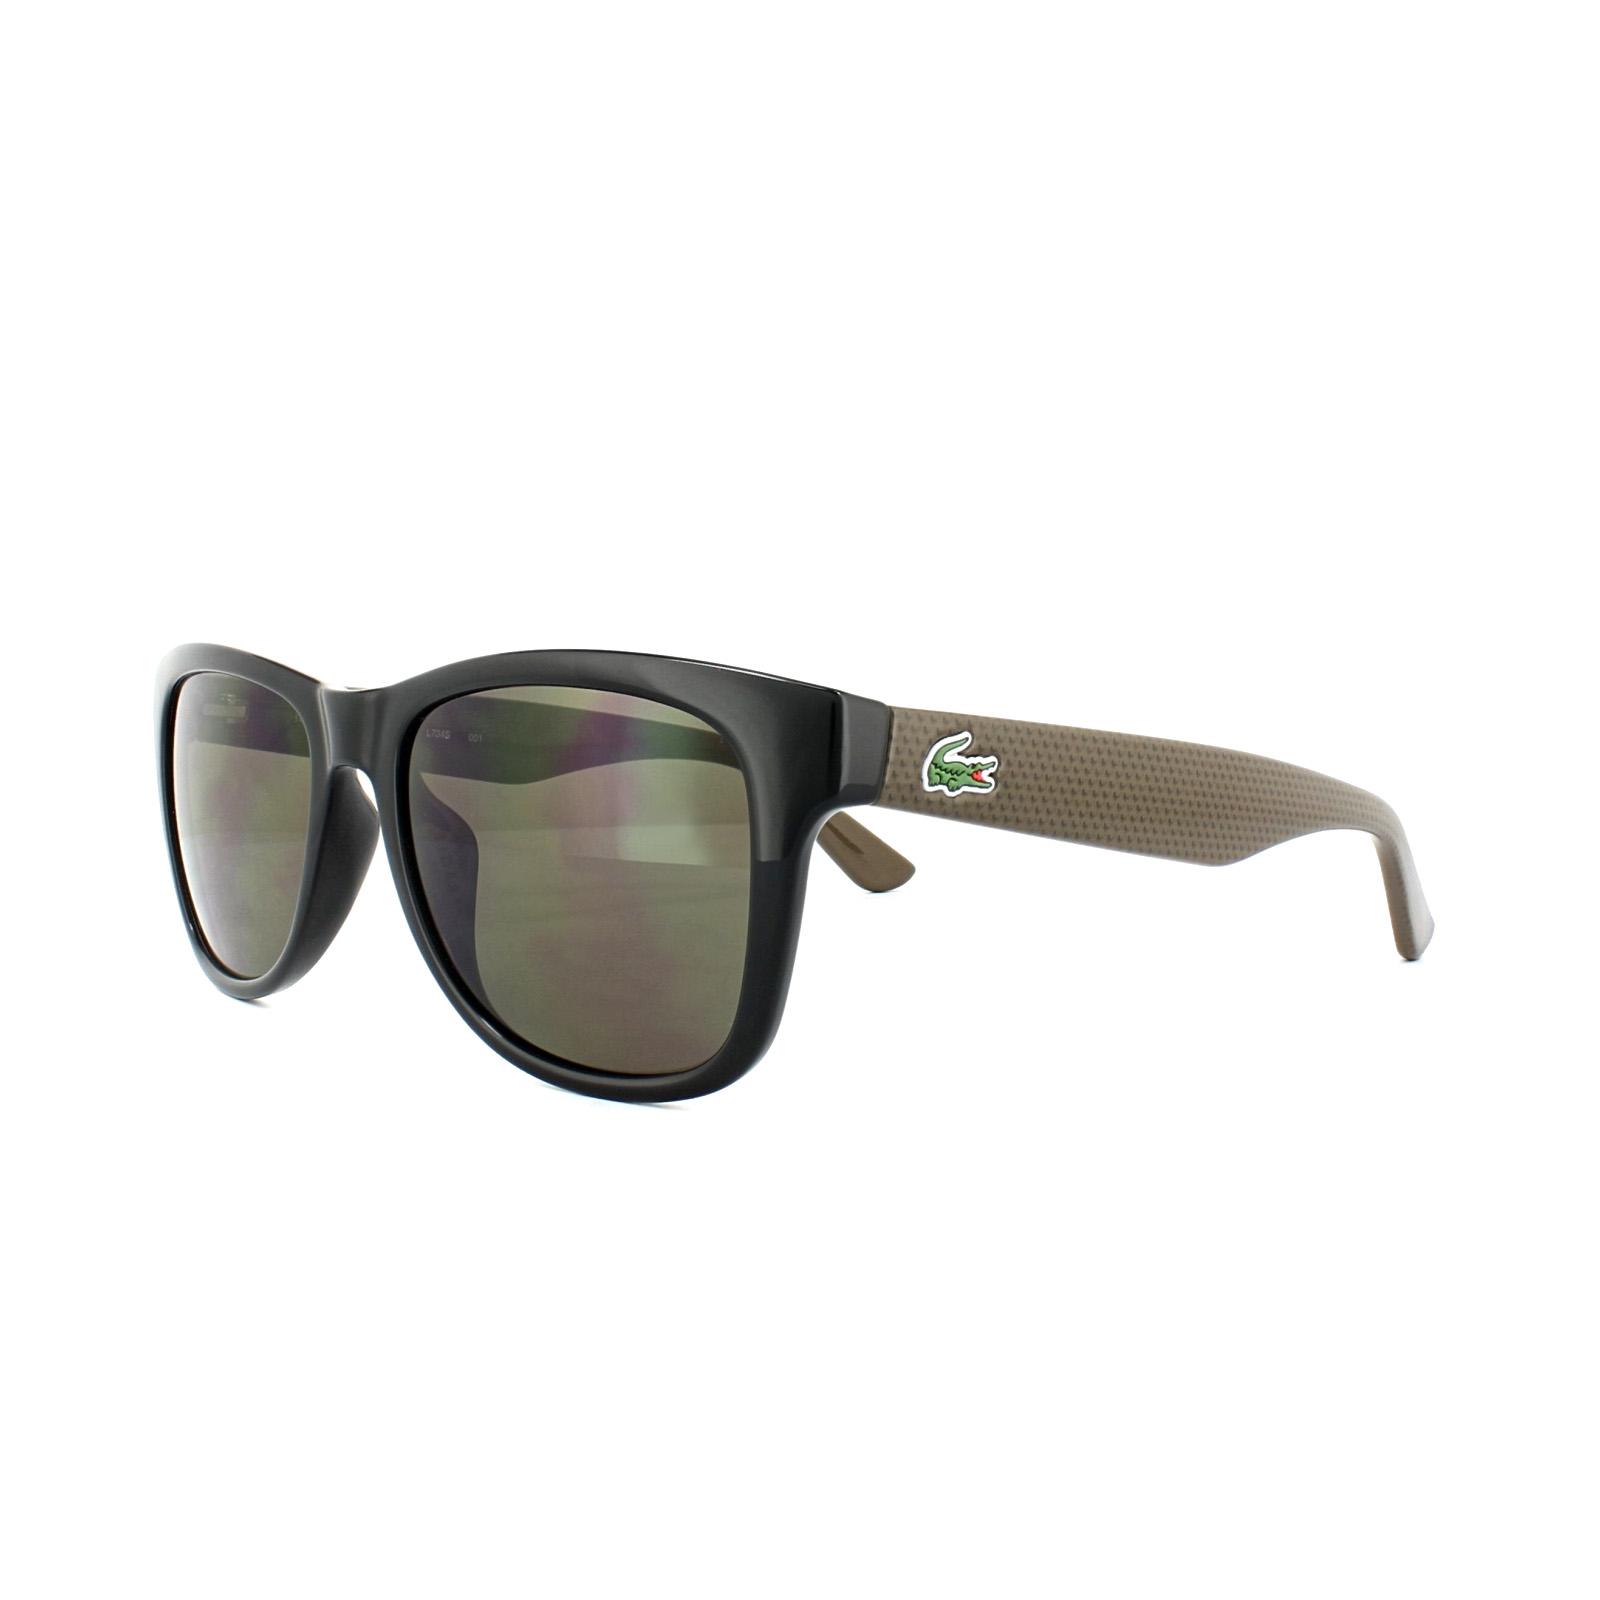 7f02b4c7b25 Lacoste Sunglasses L734S 001 Black Brown Grey Gradient 883121973480 ...